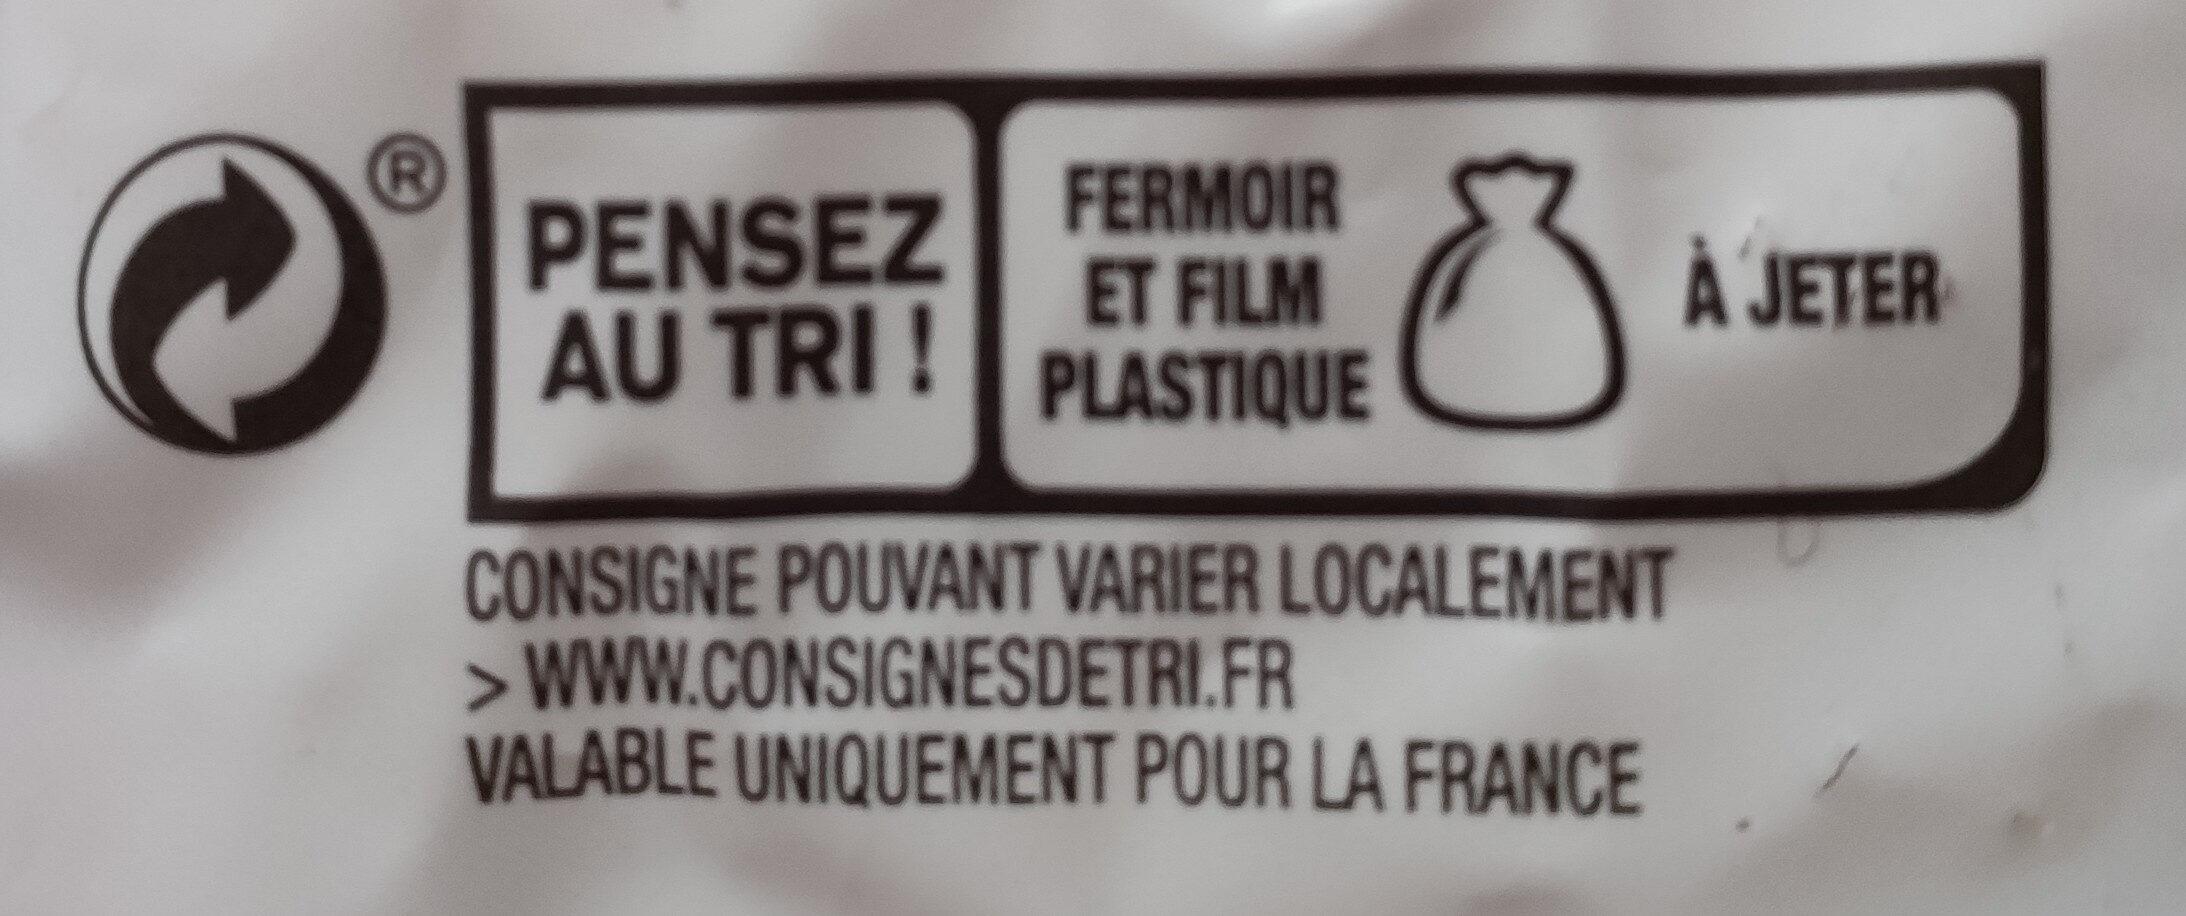 Le Moelleux aux céréales et graines - Recycling instructions and/or packaging information - fr